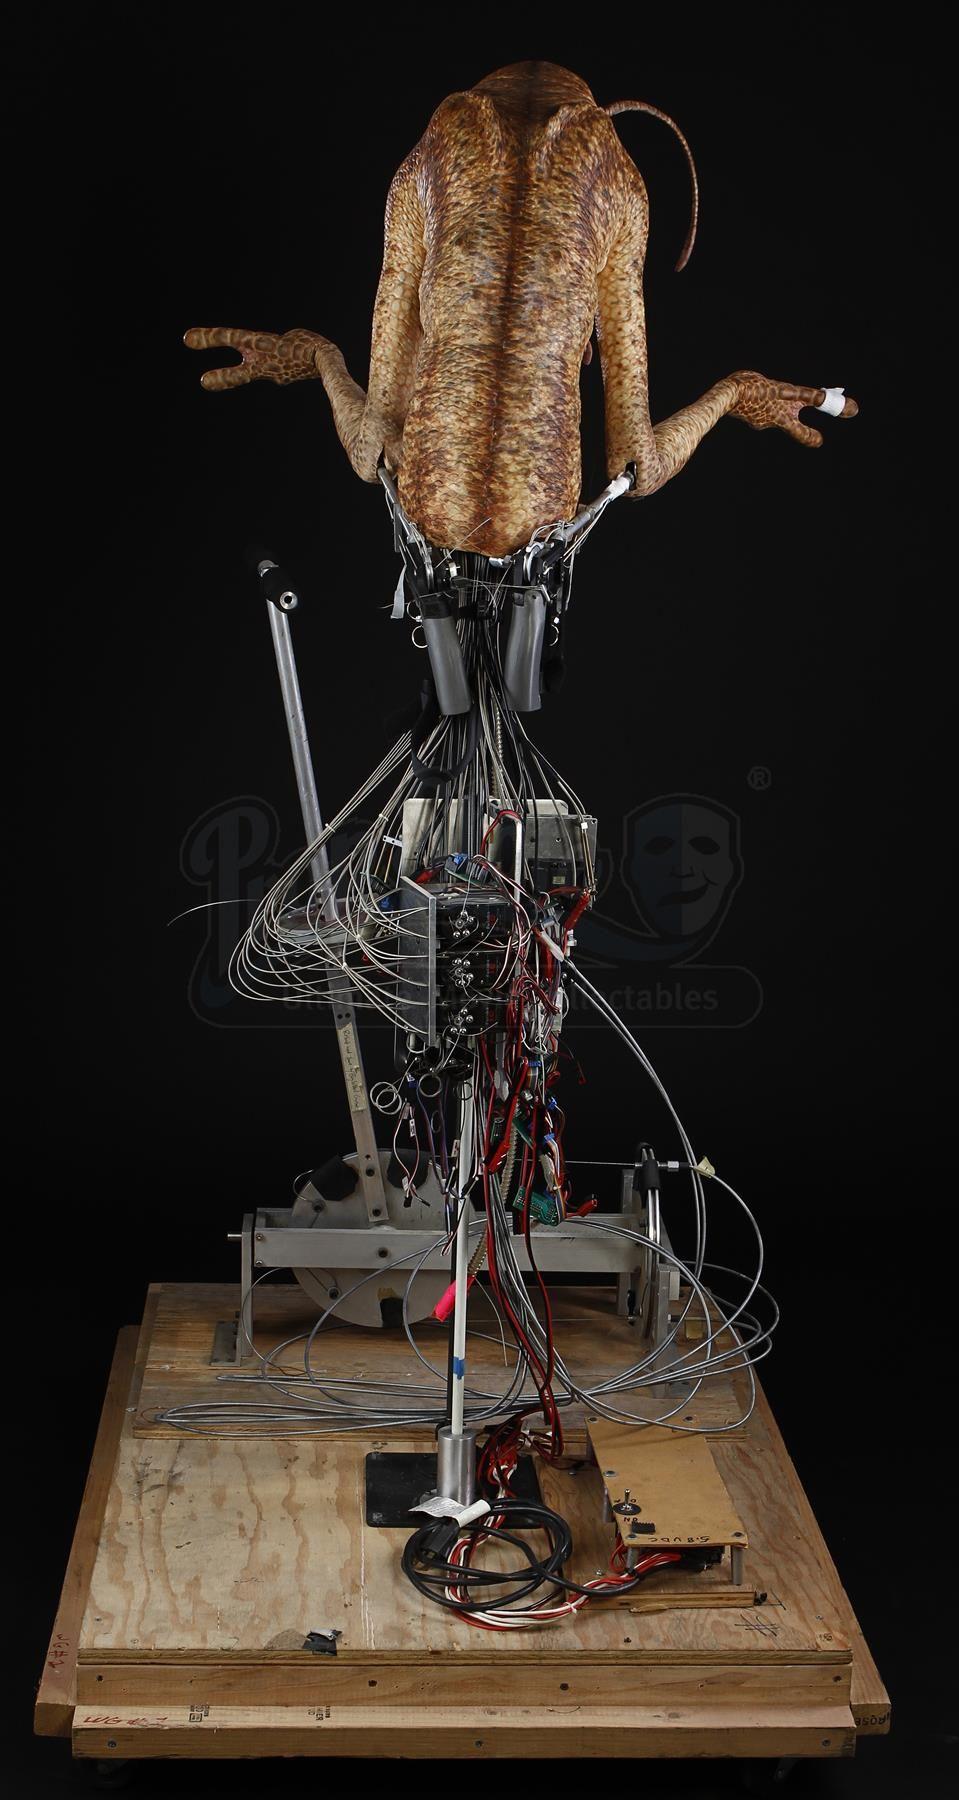 MEN IN BLACK II (2002) - Oversized Worm Guy Animatronic Insert Puppet - Price Estimate: $8000 - $10000